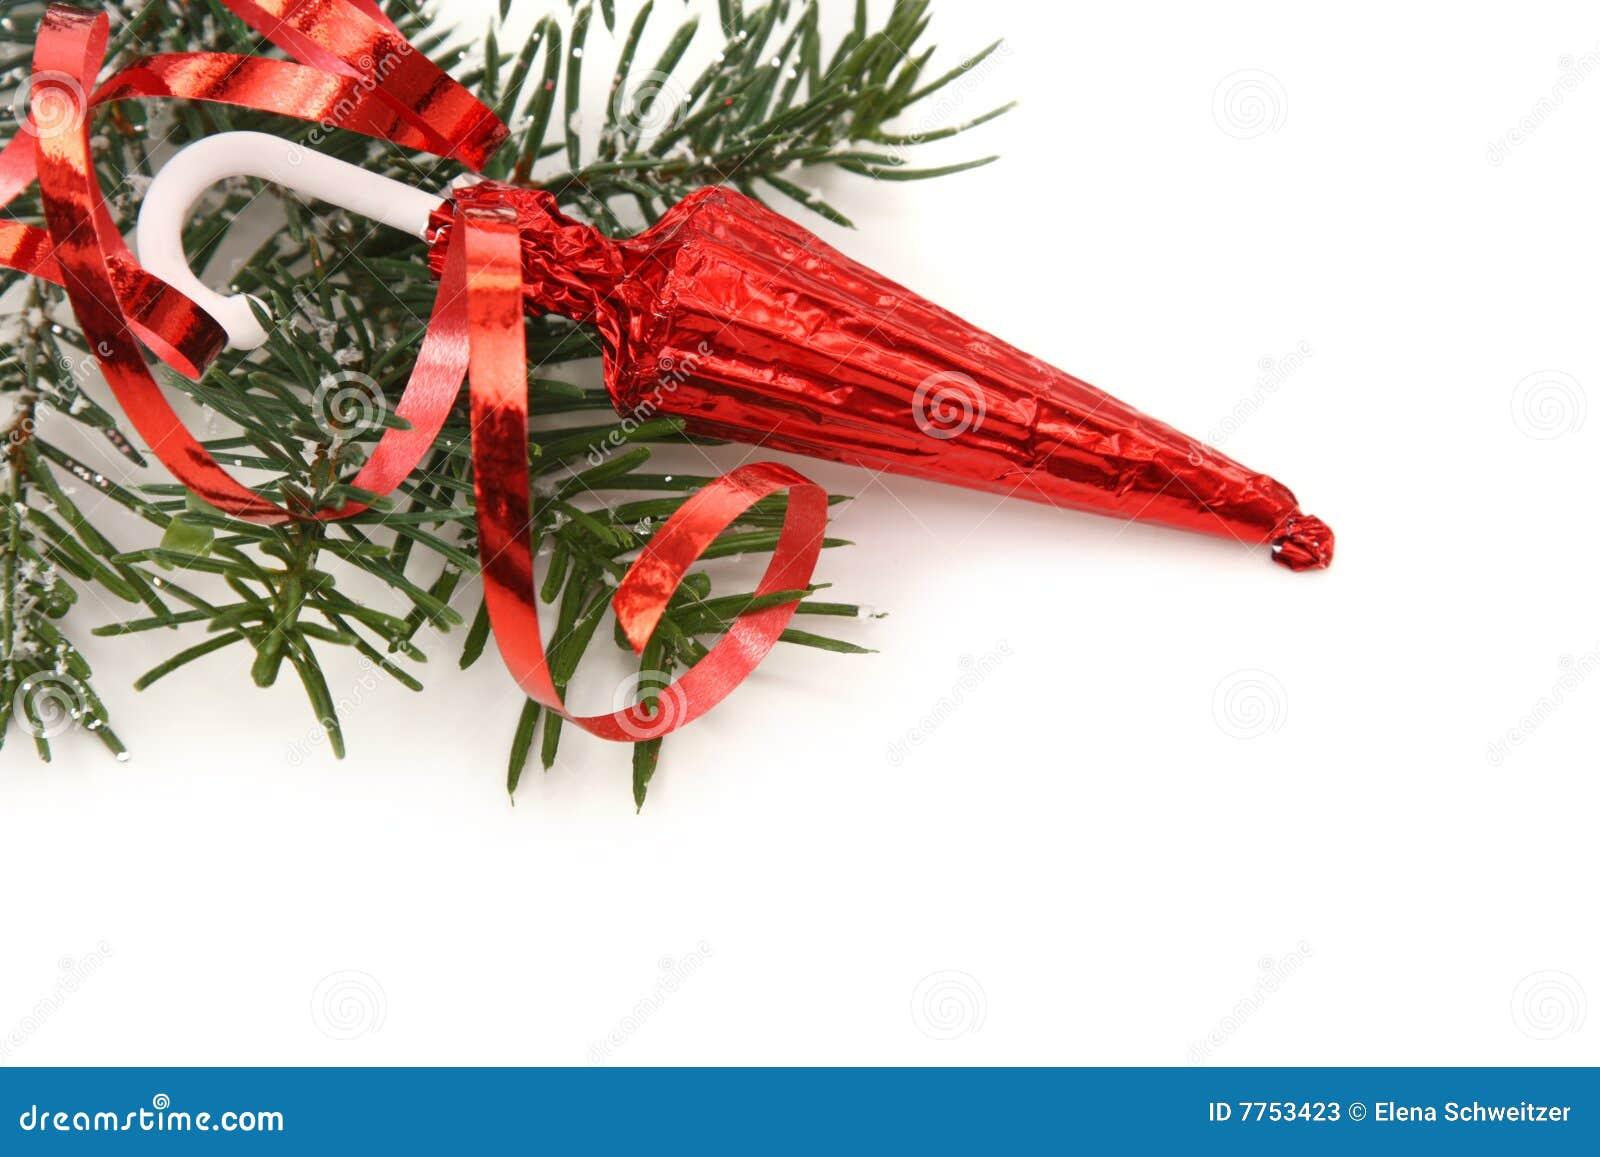 download christmas tree with sweet umbrella stock image image of year needles 7753423 - Umbrella Christmas Tree